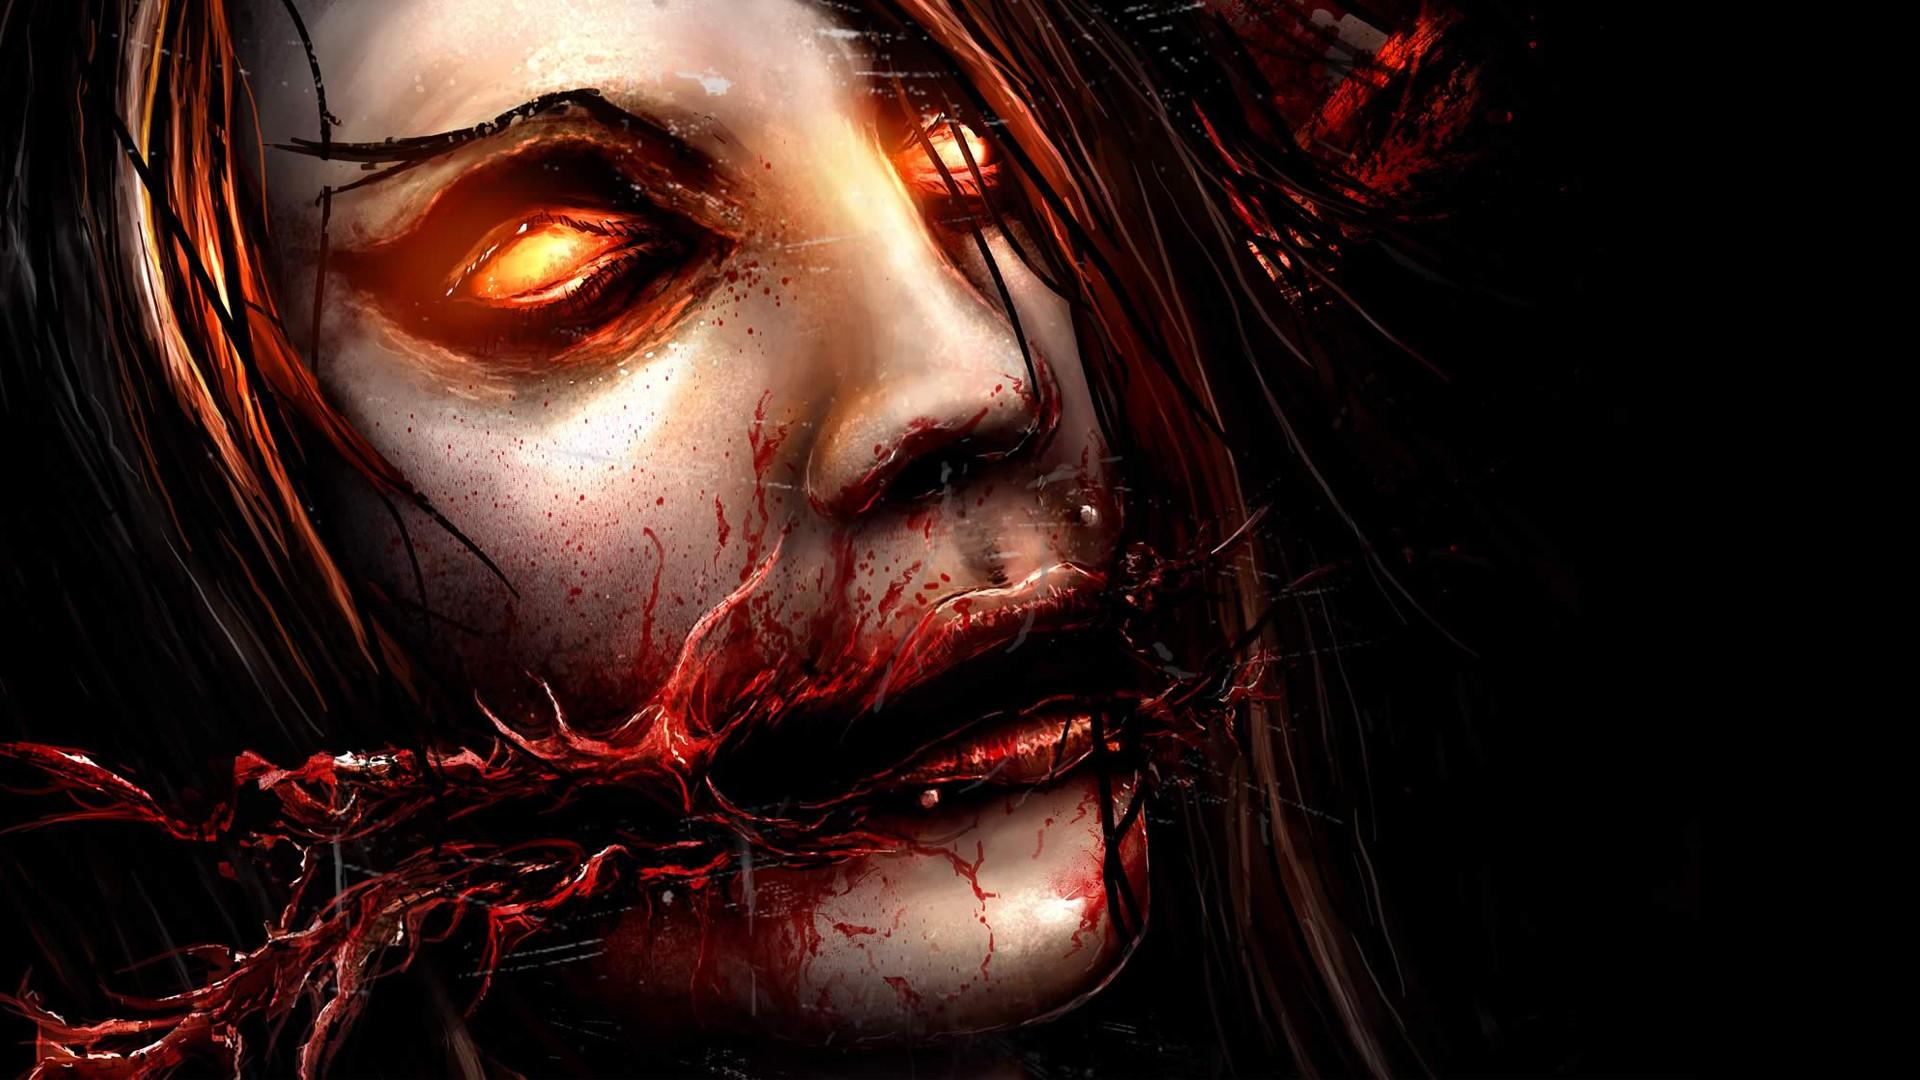 Res: 1920x1080, Chelsea Grin Face Creepy Drawing heavy metal hard rock dark blood horror  macabre demon eyes wallpaper |  | 79500 | WallpaperUP